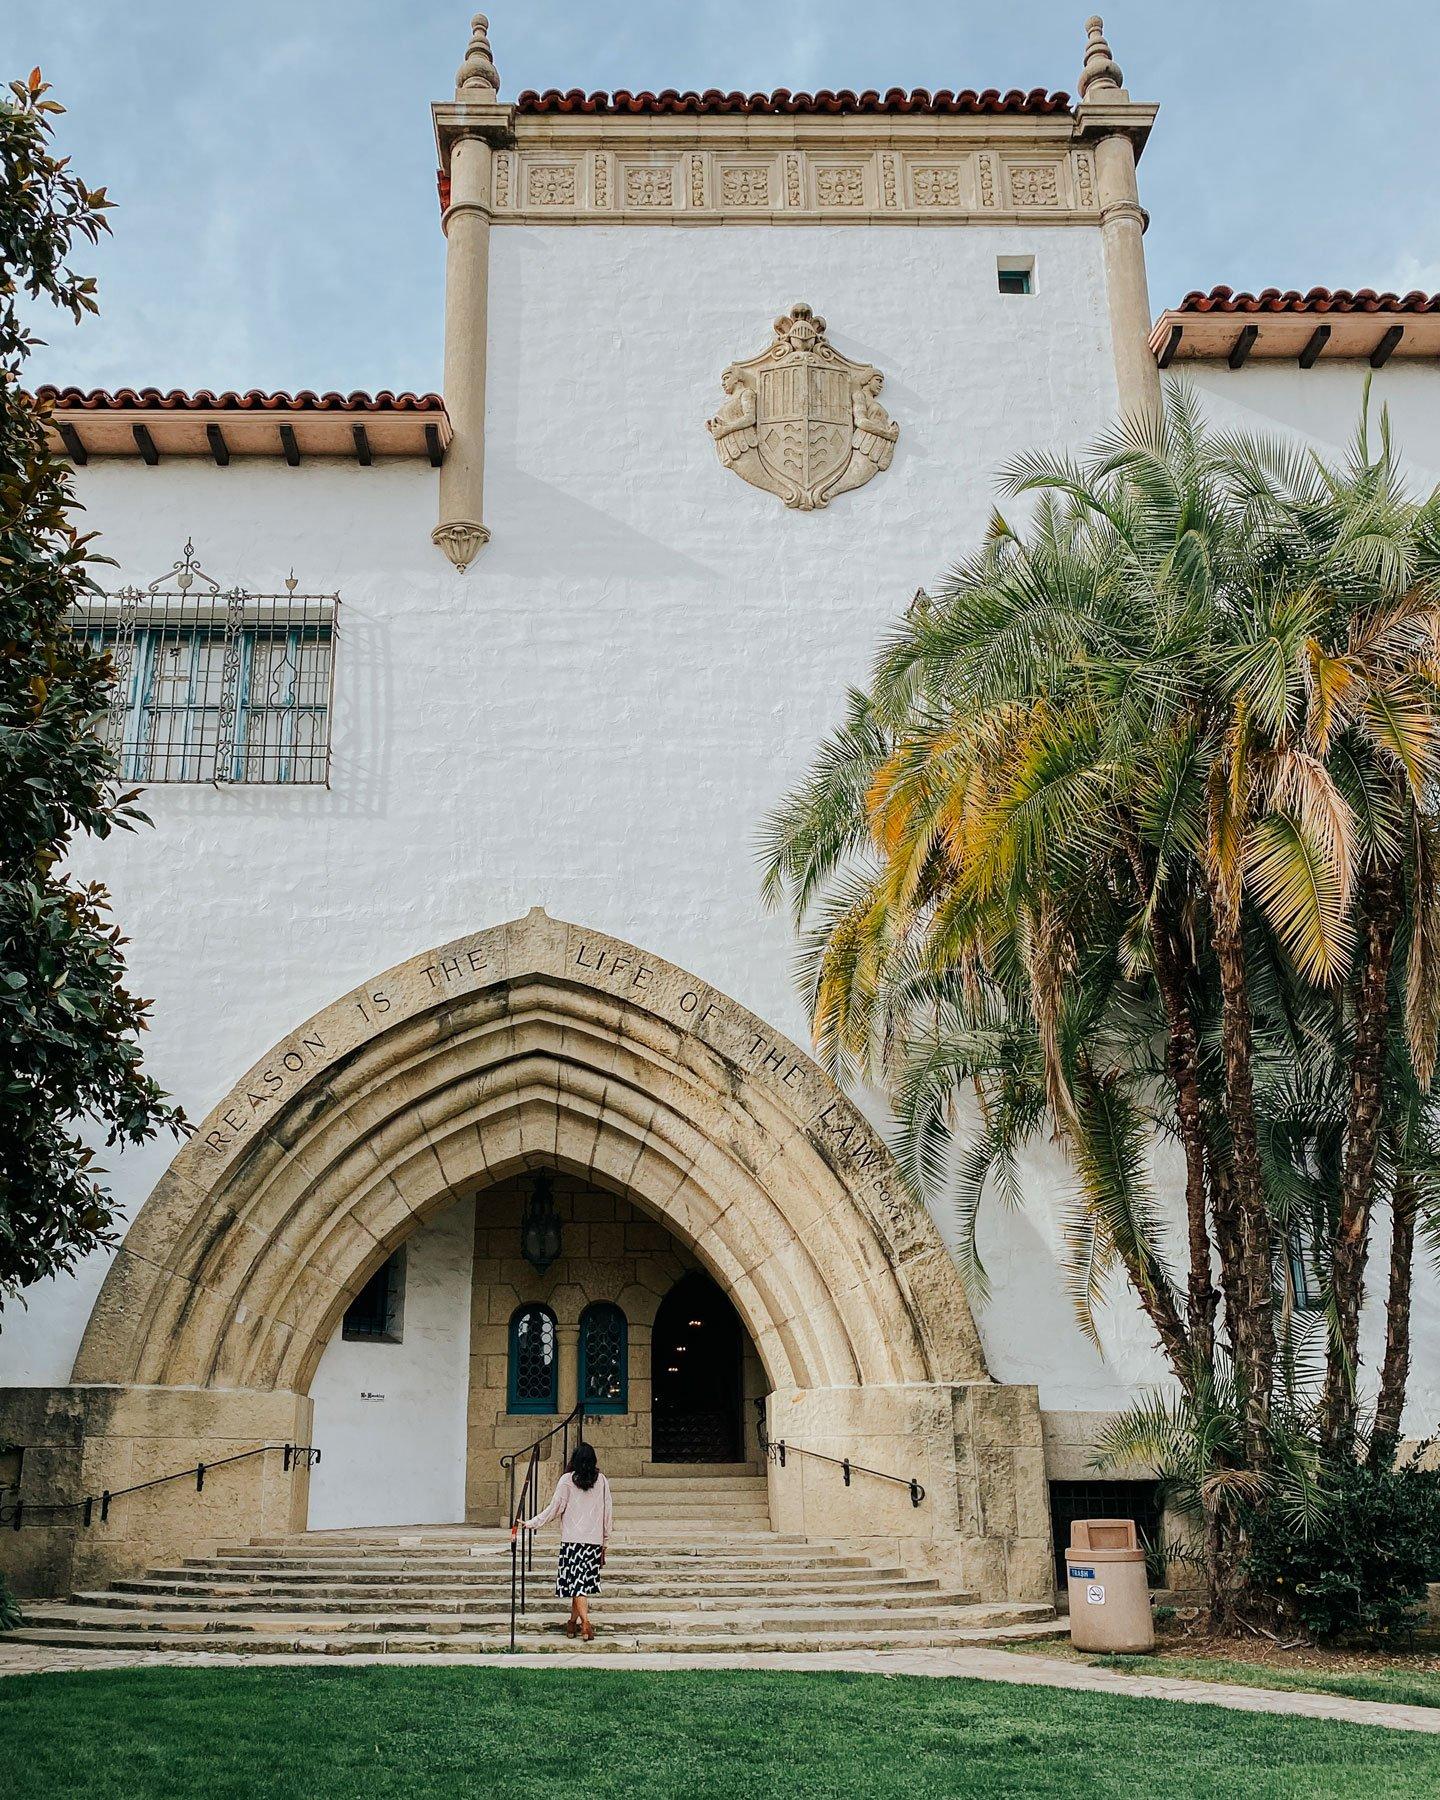 Santa Barbara Courthouse backside